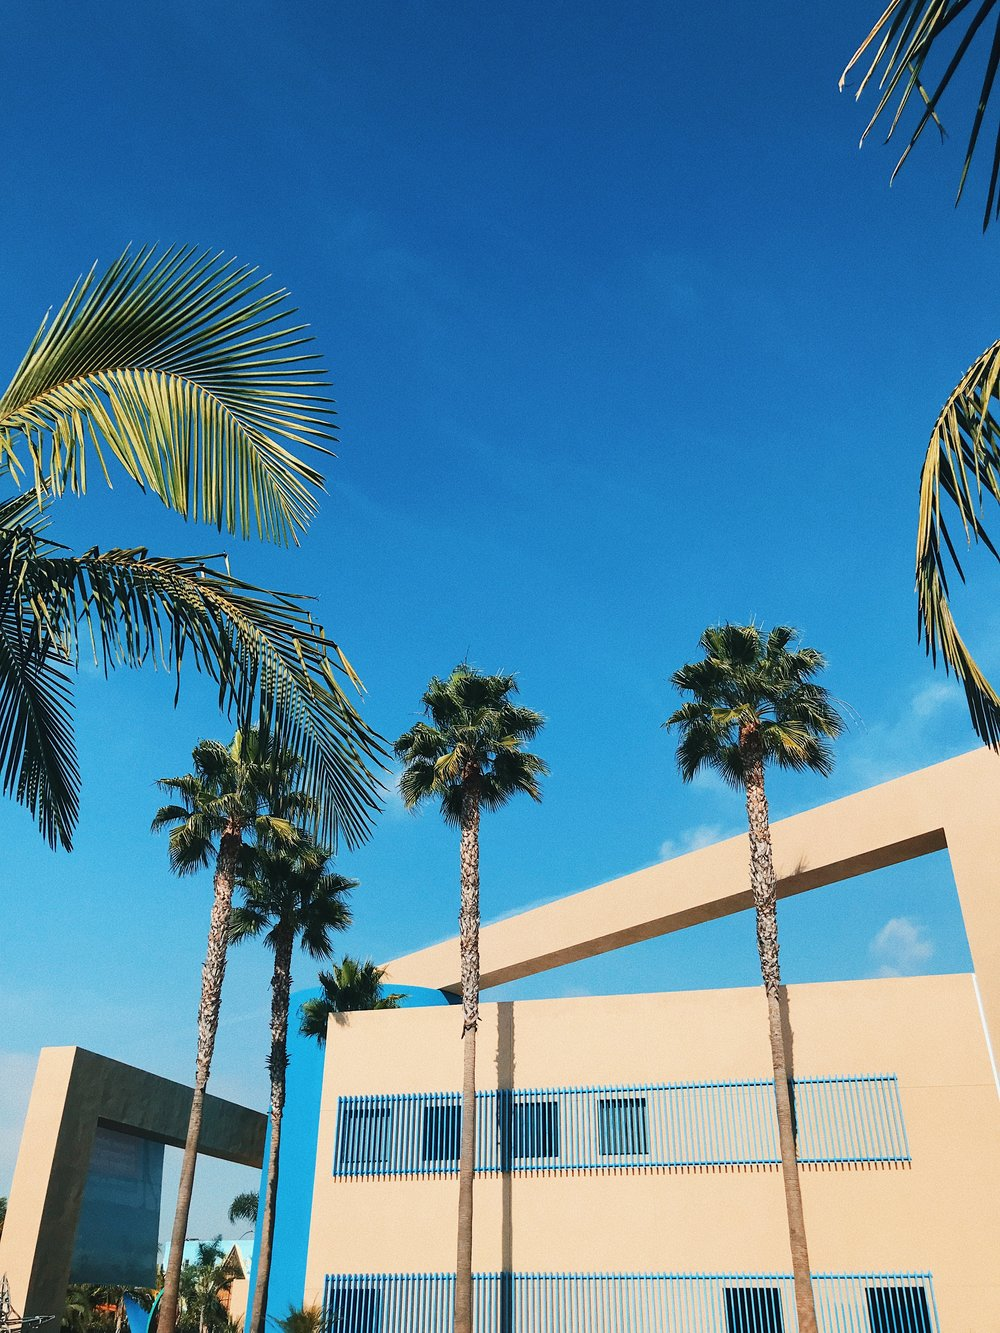 - Museum of Latin American Art (MOLAA), Long Beach